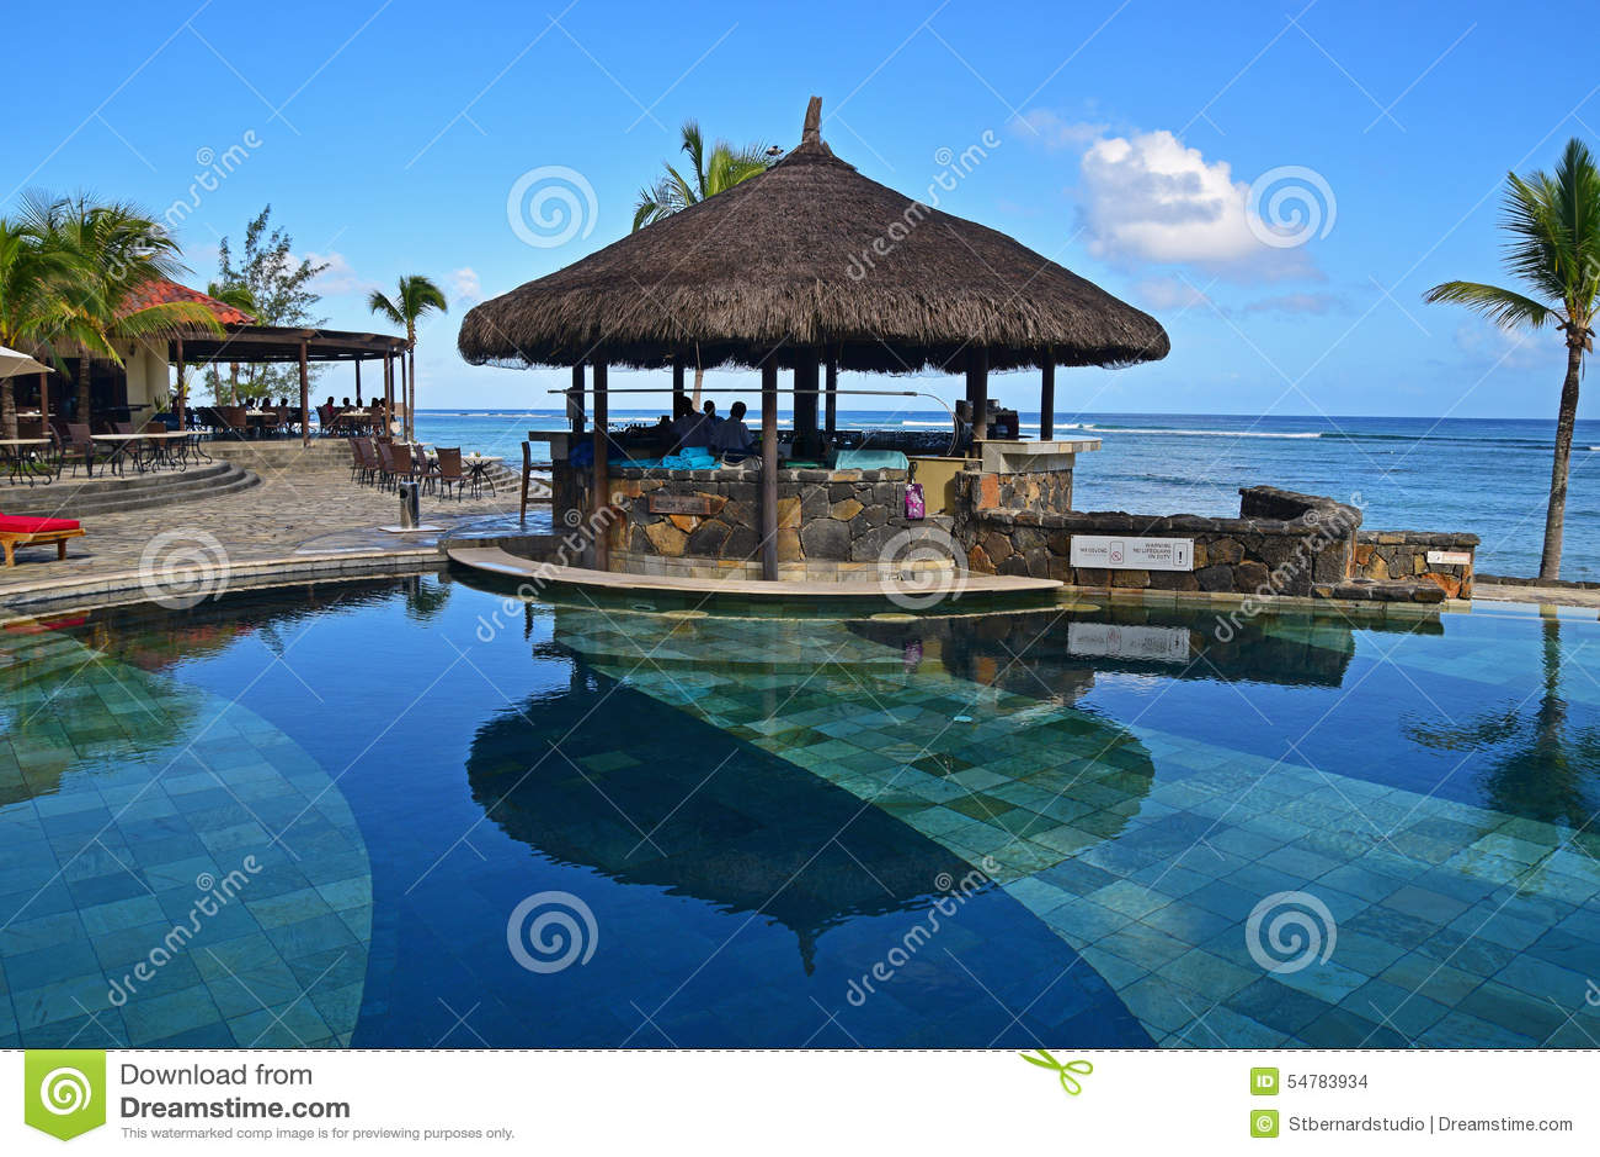 Pool Gazebo Plans Gazebo Bar Next To A Pool At Tropical Beach Of A Hotel